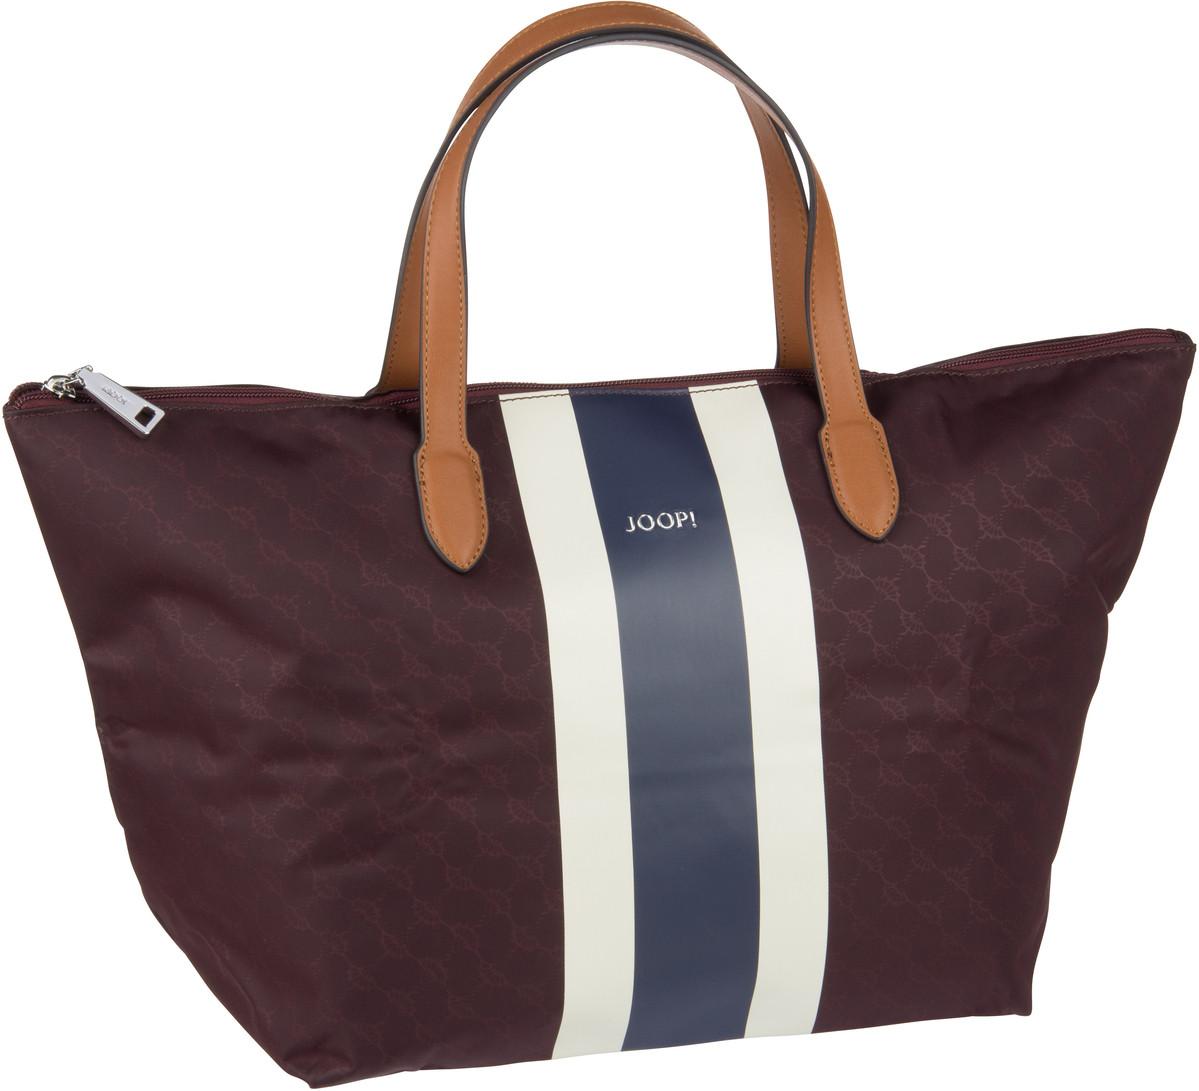 Shopper Piccolina Due Helena HandBag LHZ Burgundy